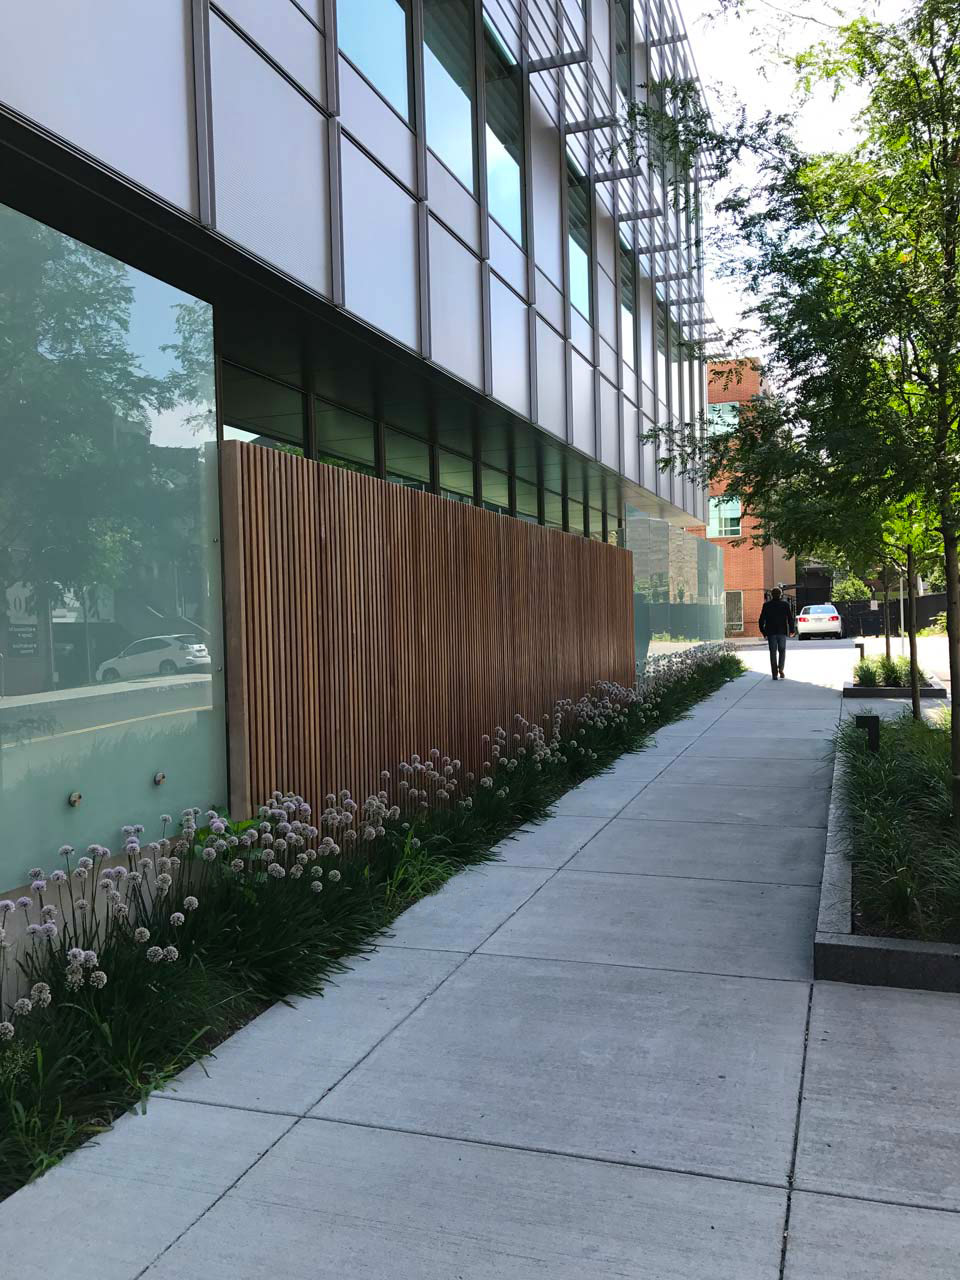 Brigham-and-Women's-Exterior-Planting1-KMDG.jpg